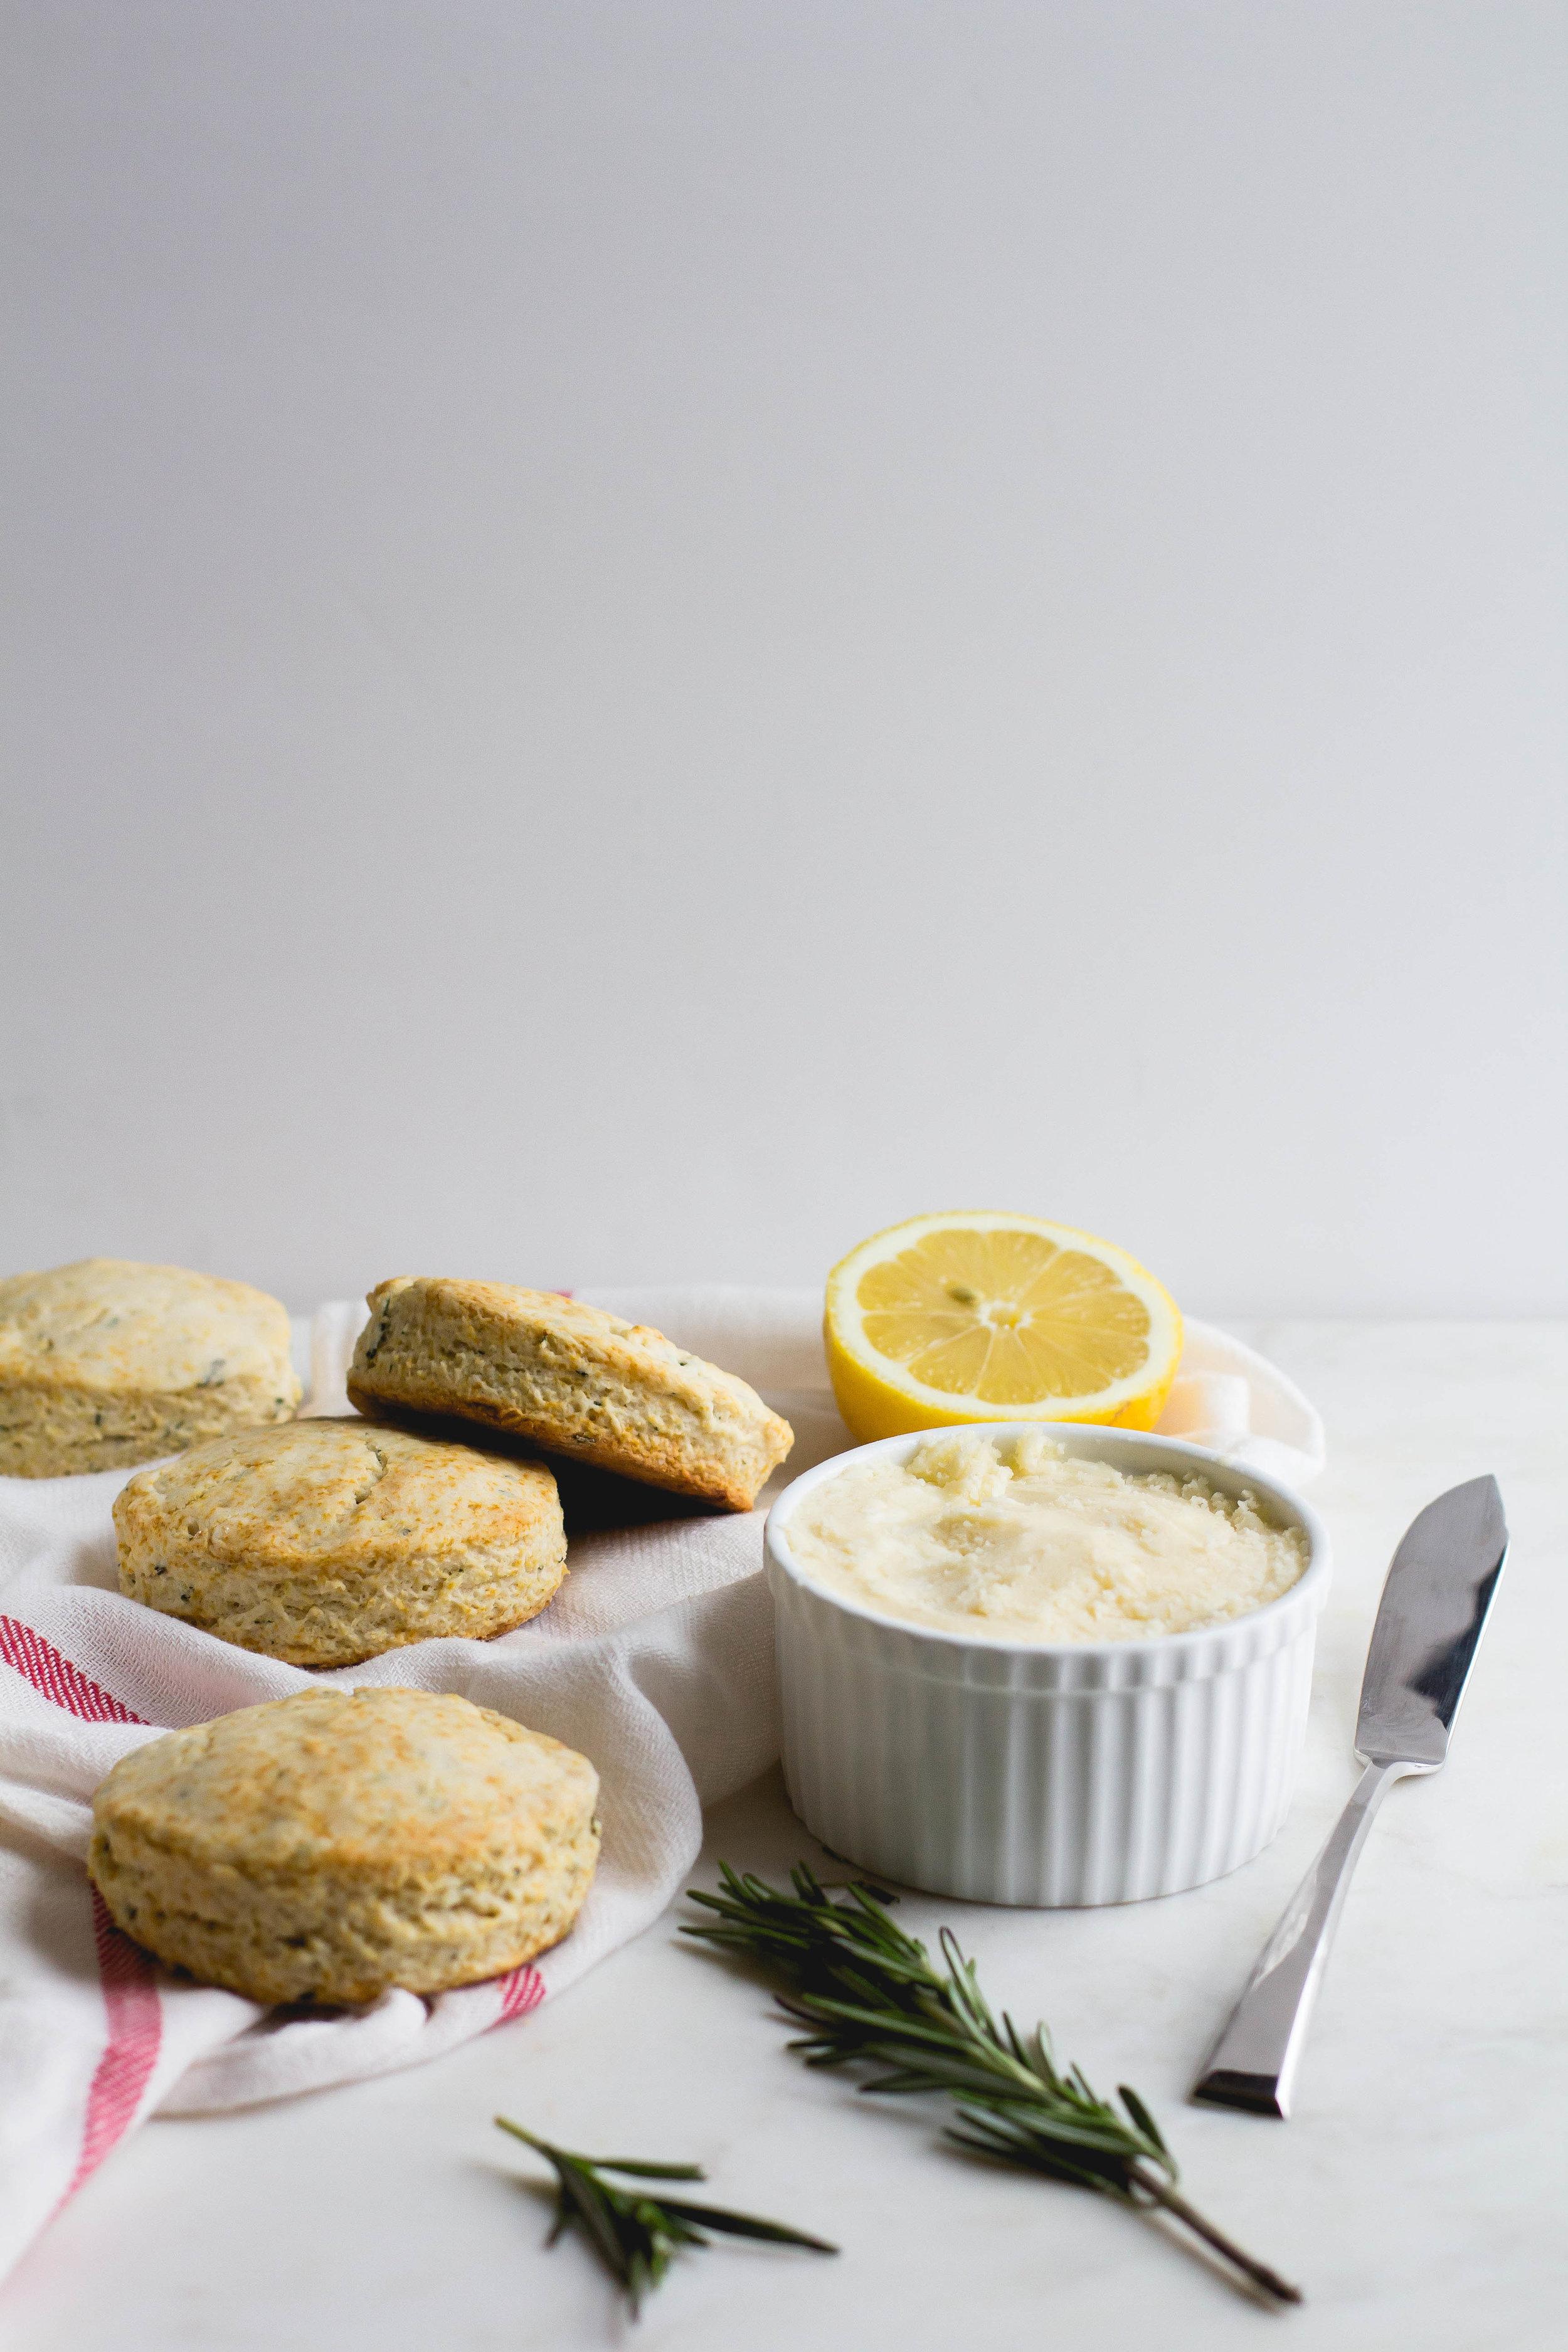 Lemon + Rosemary Biscuits with Lemon-Honey Butter | Sarah J. Hauser